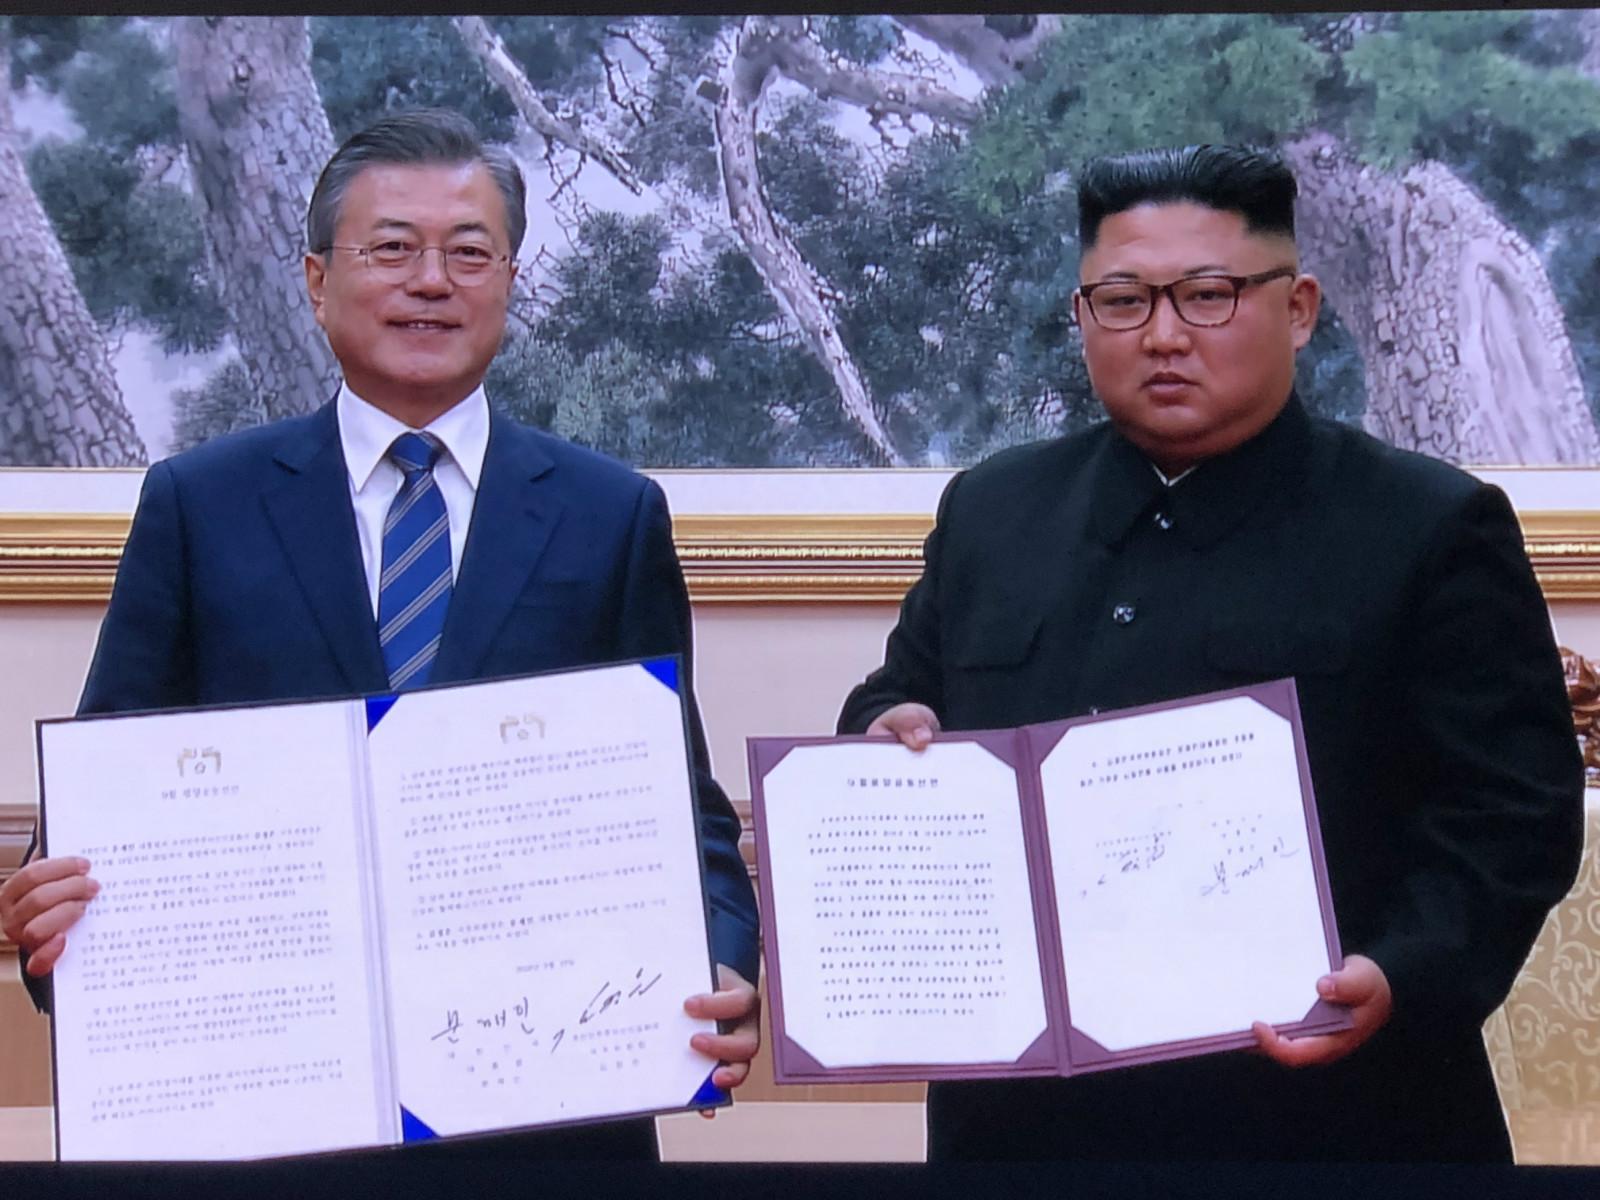 Moon, Kim sign summit agreement in Pyongyang: Yonhap